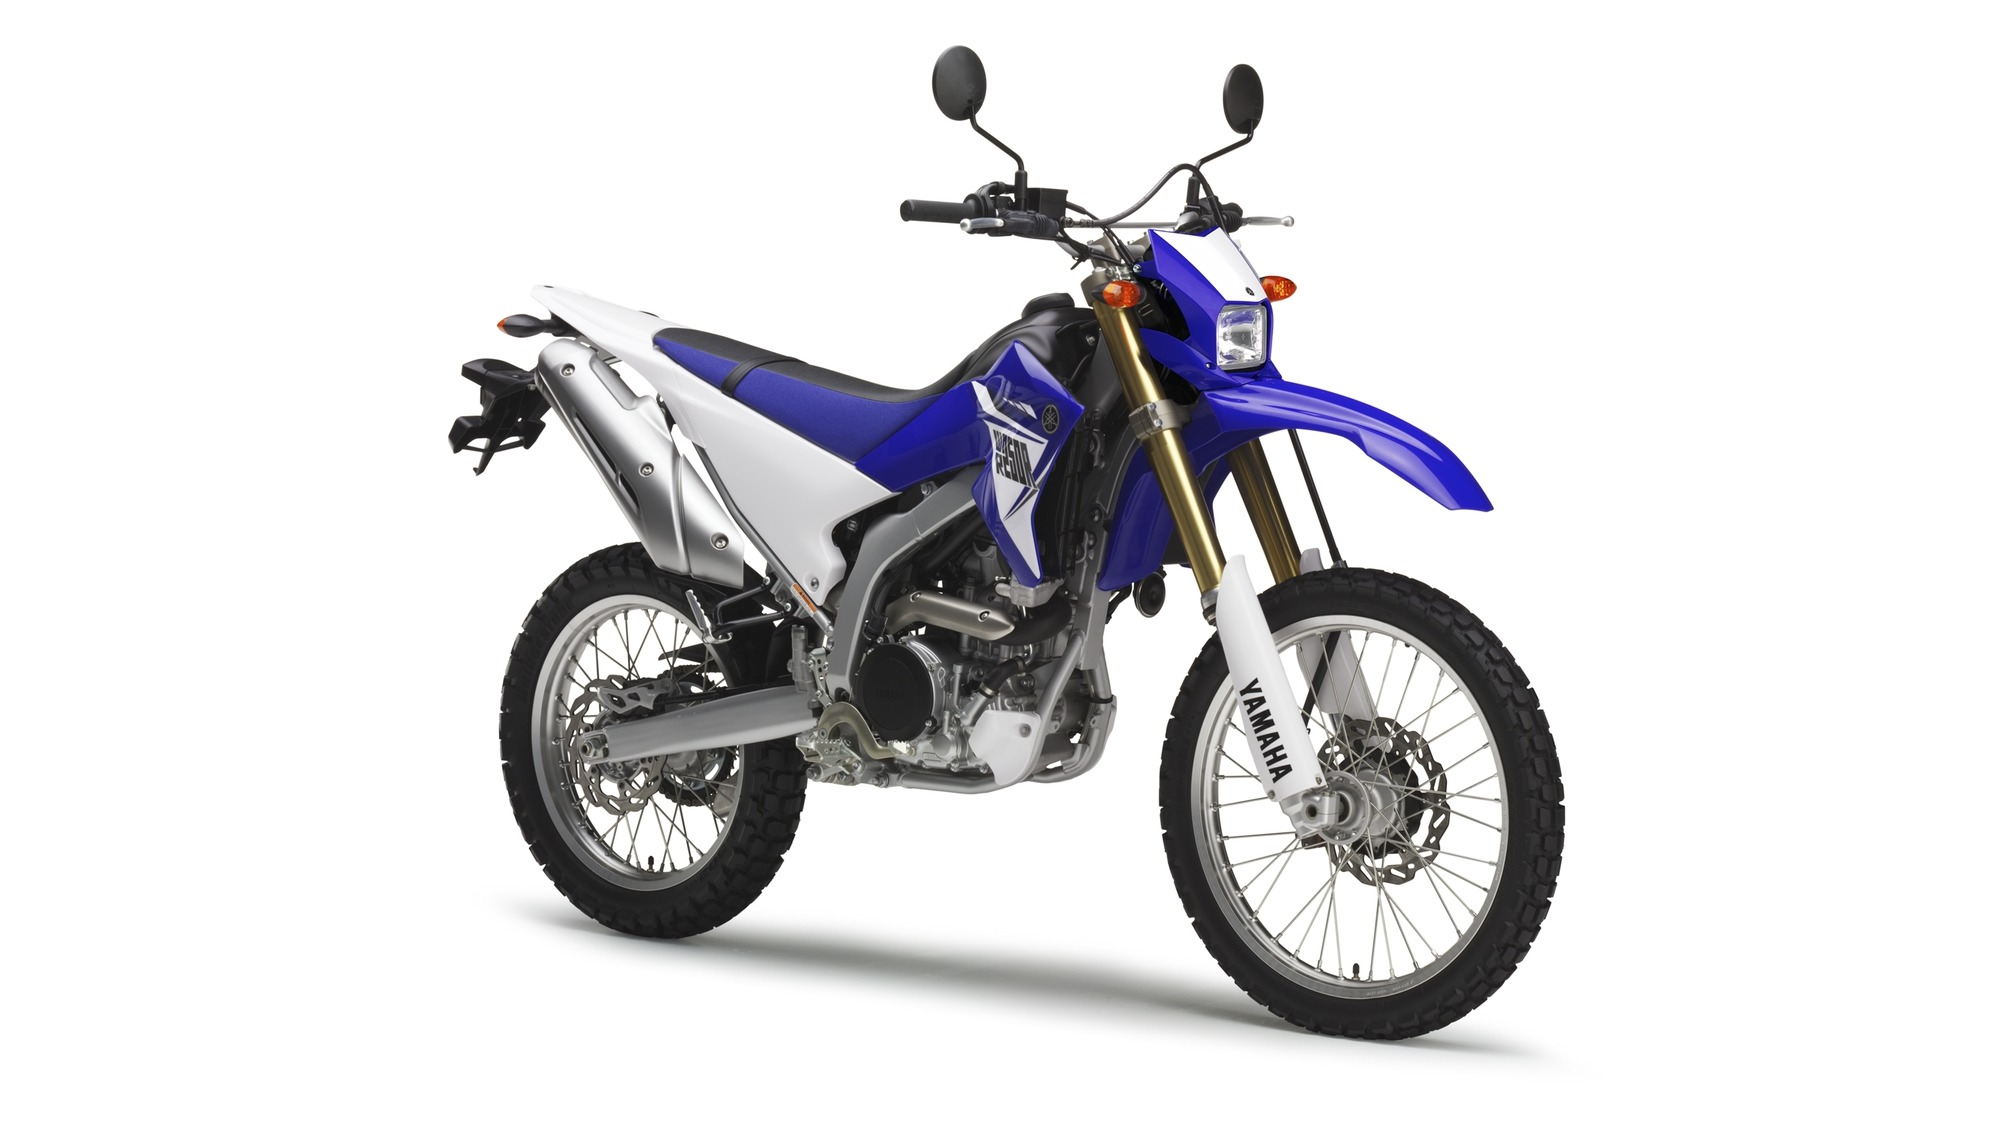 http://cdn.yamaha-motor.eu/product_assets/2014/WR250FR/2014-Yamaha-WR250R-EU-Racing-Blue-Studio-001.jpg